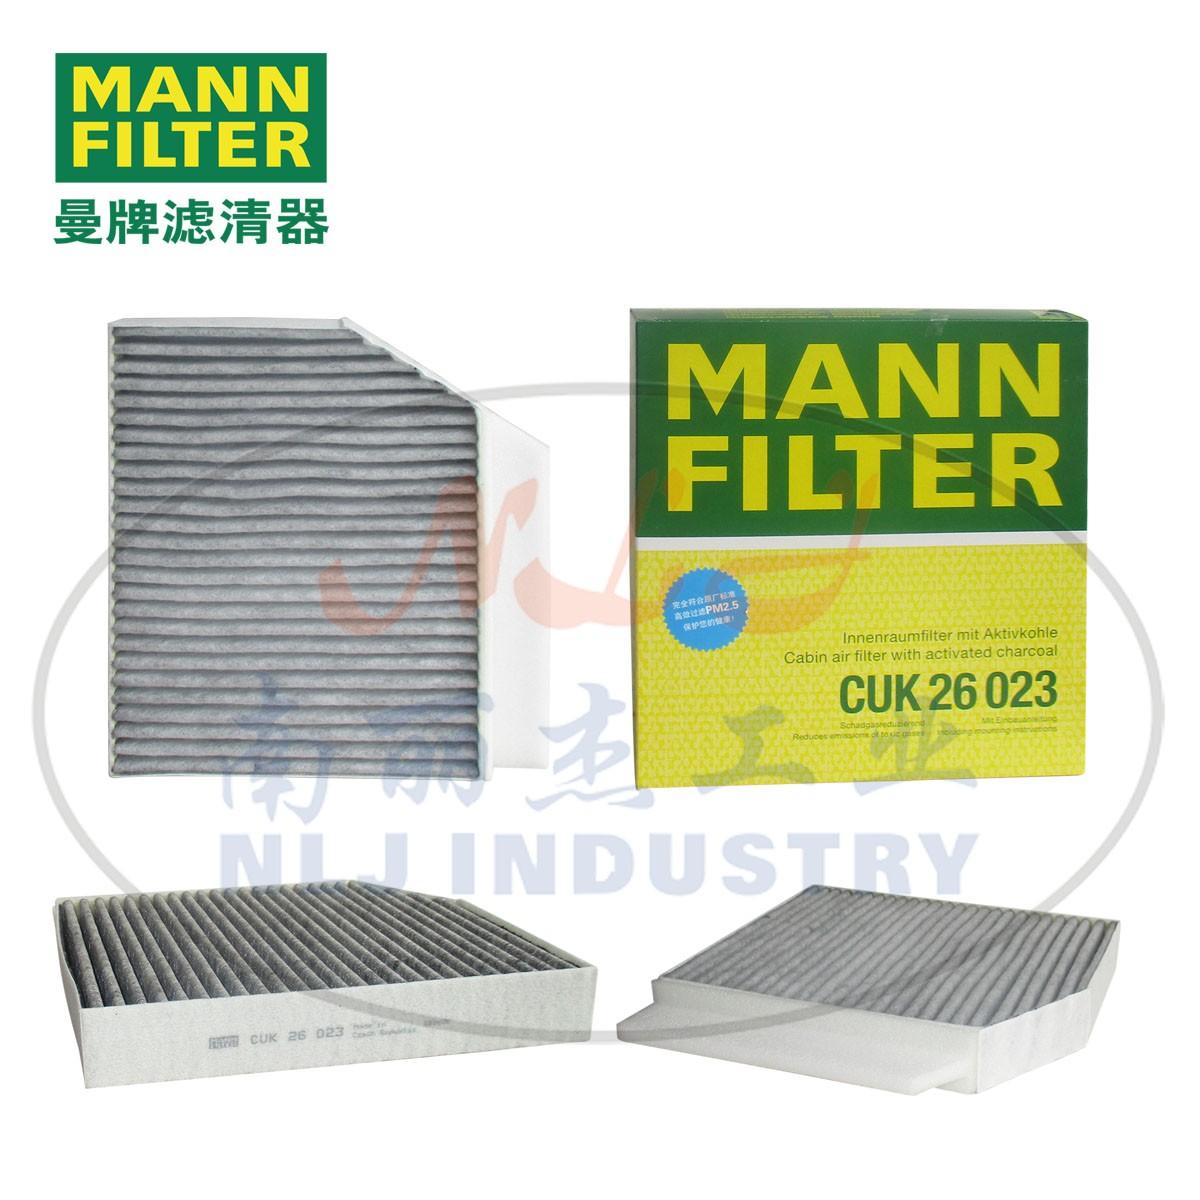 MANN-FILTER 曼牌滤清器 活性炭空调滤芯 CUK26023